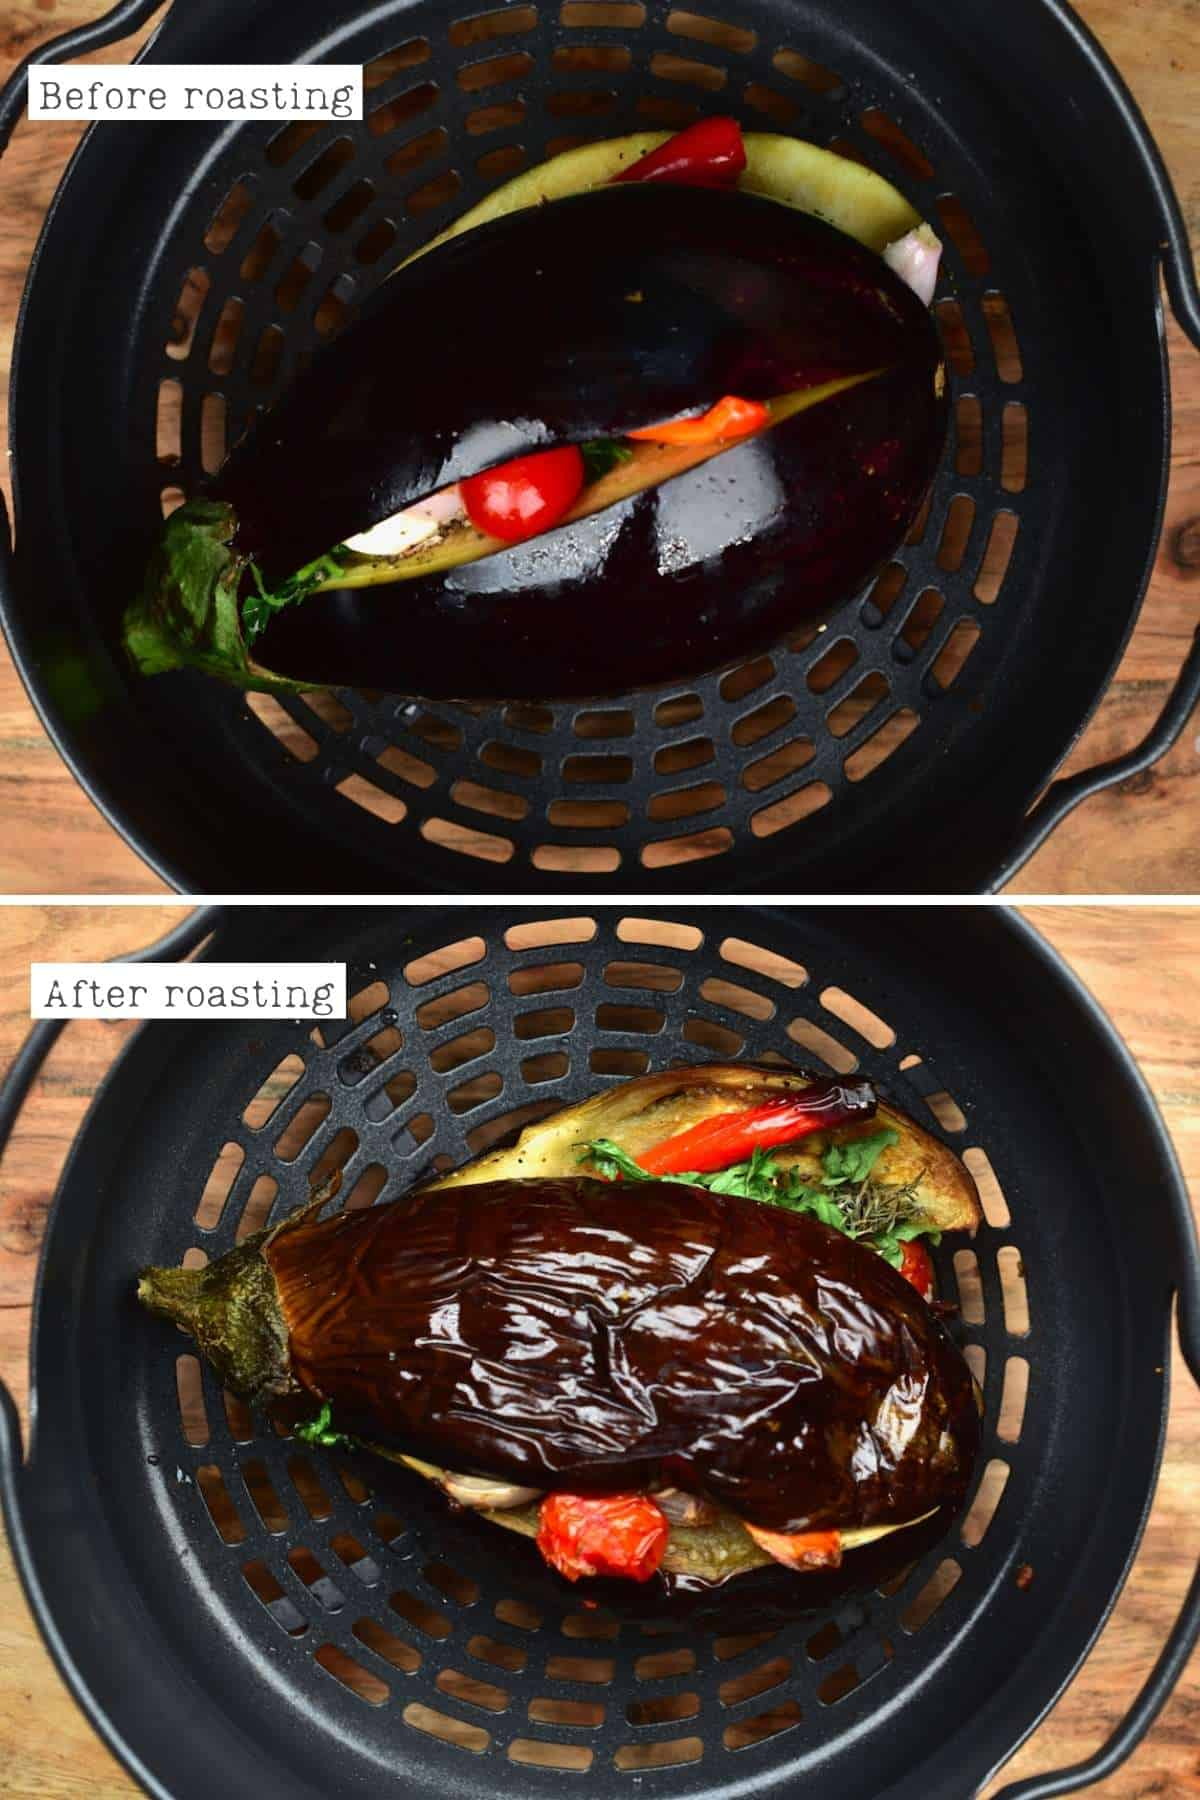 Steps for roasting eggplant